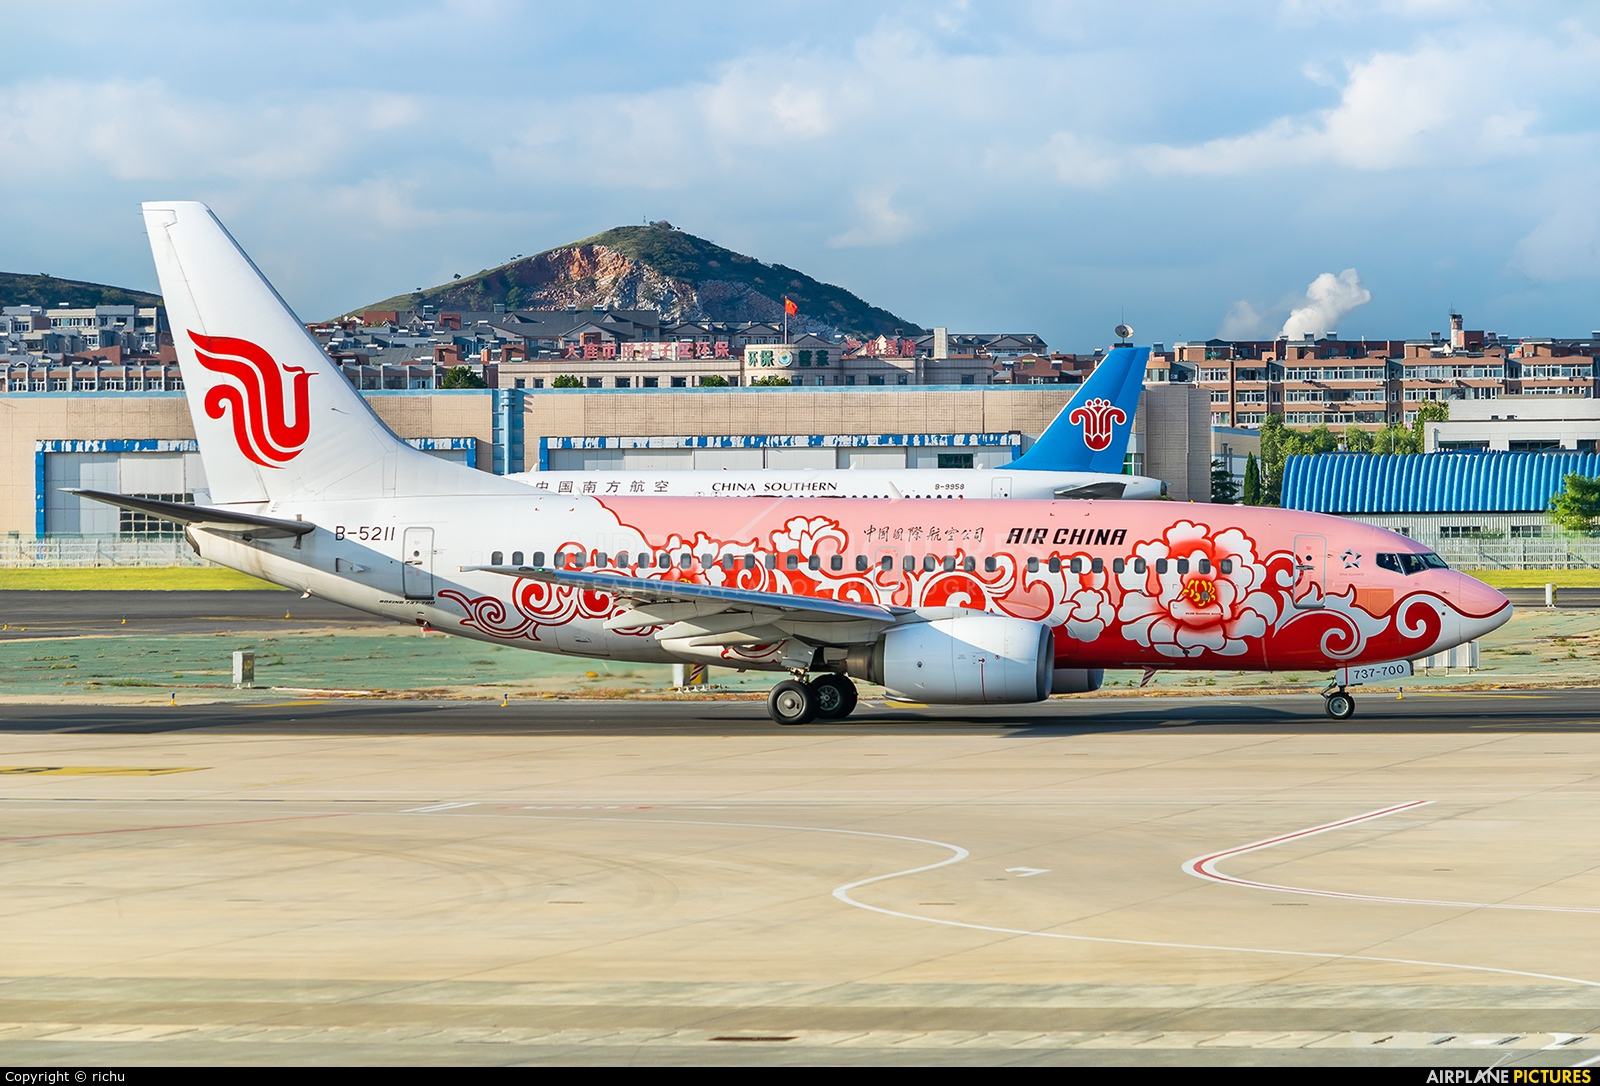 Air China B-5211 aircraft at Dalian Zhoushuizi Int'l